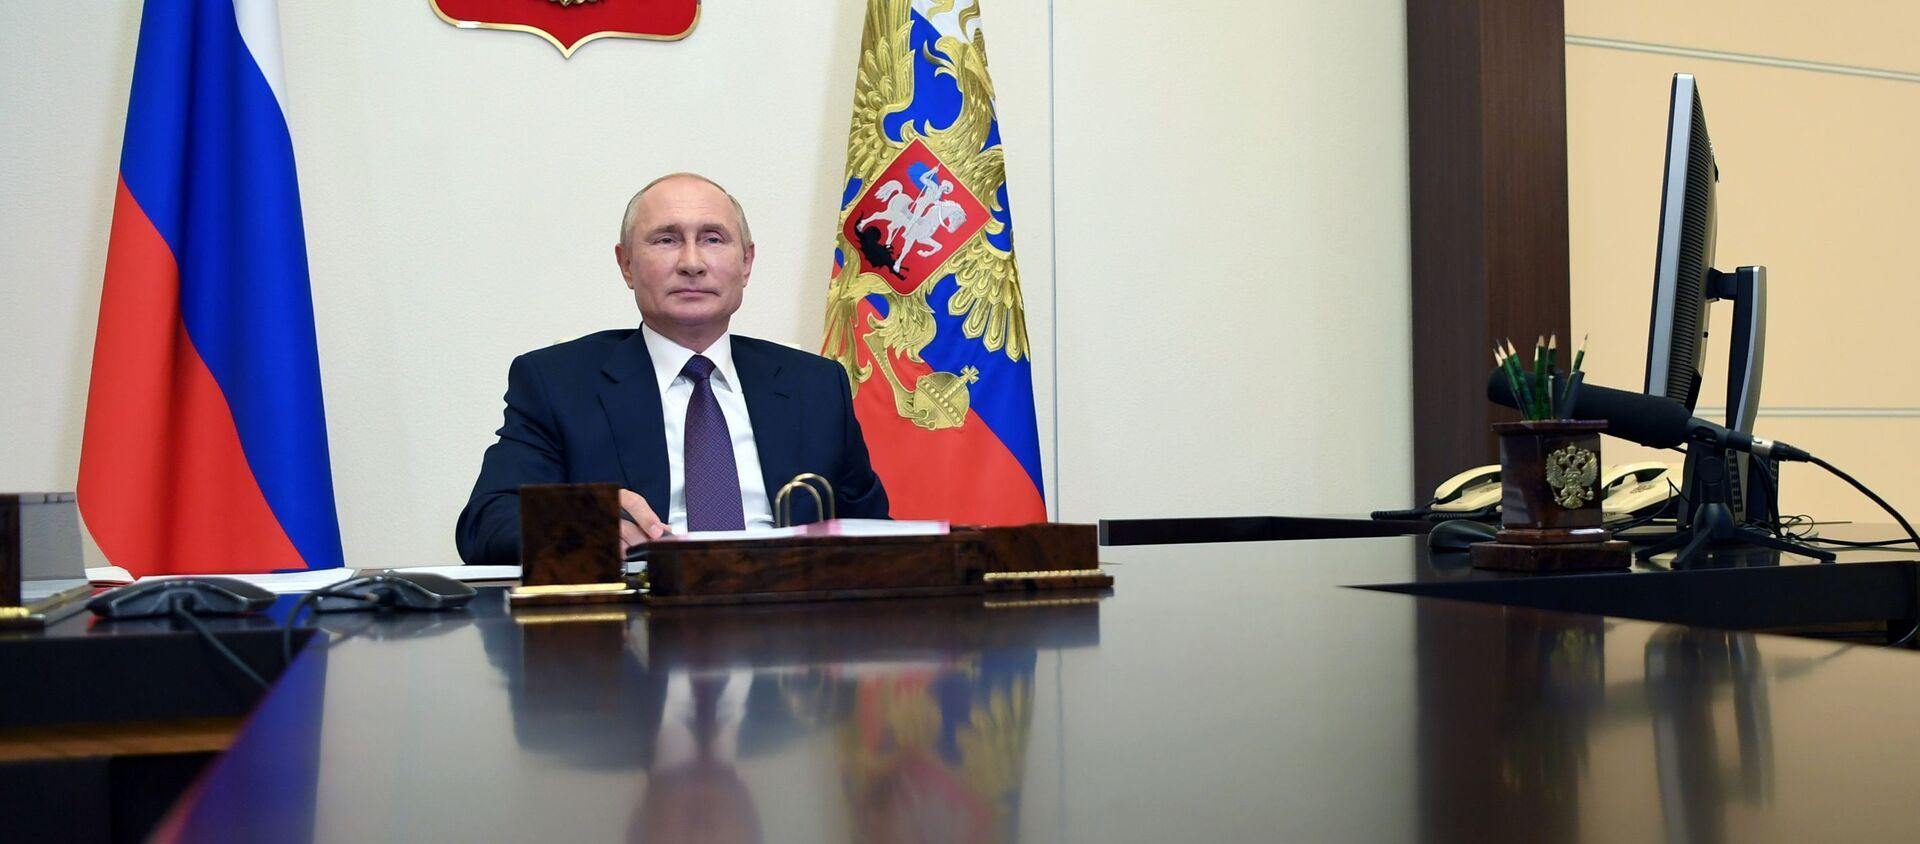 Vladimir Putin - Sputnik Việt Nam, 1920, 10.09.2020